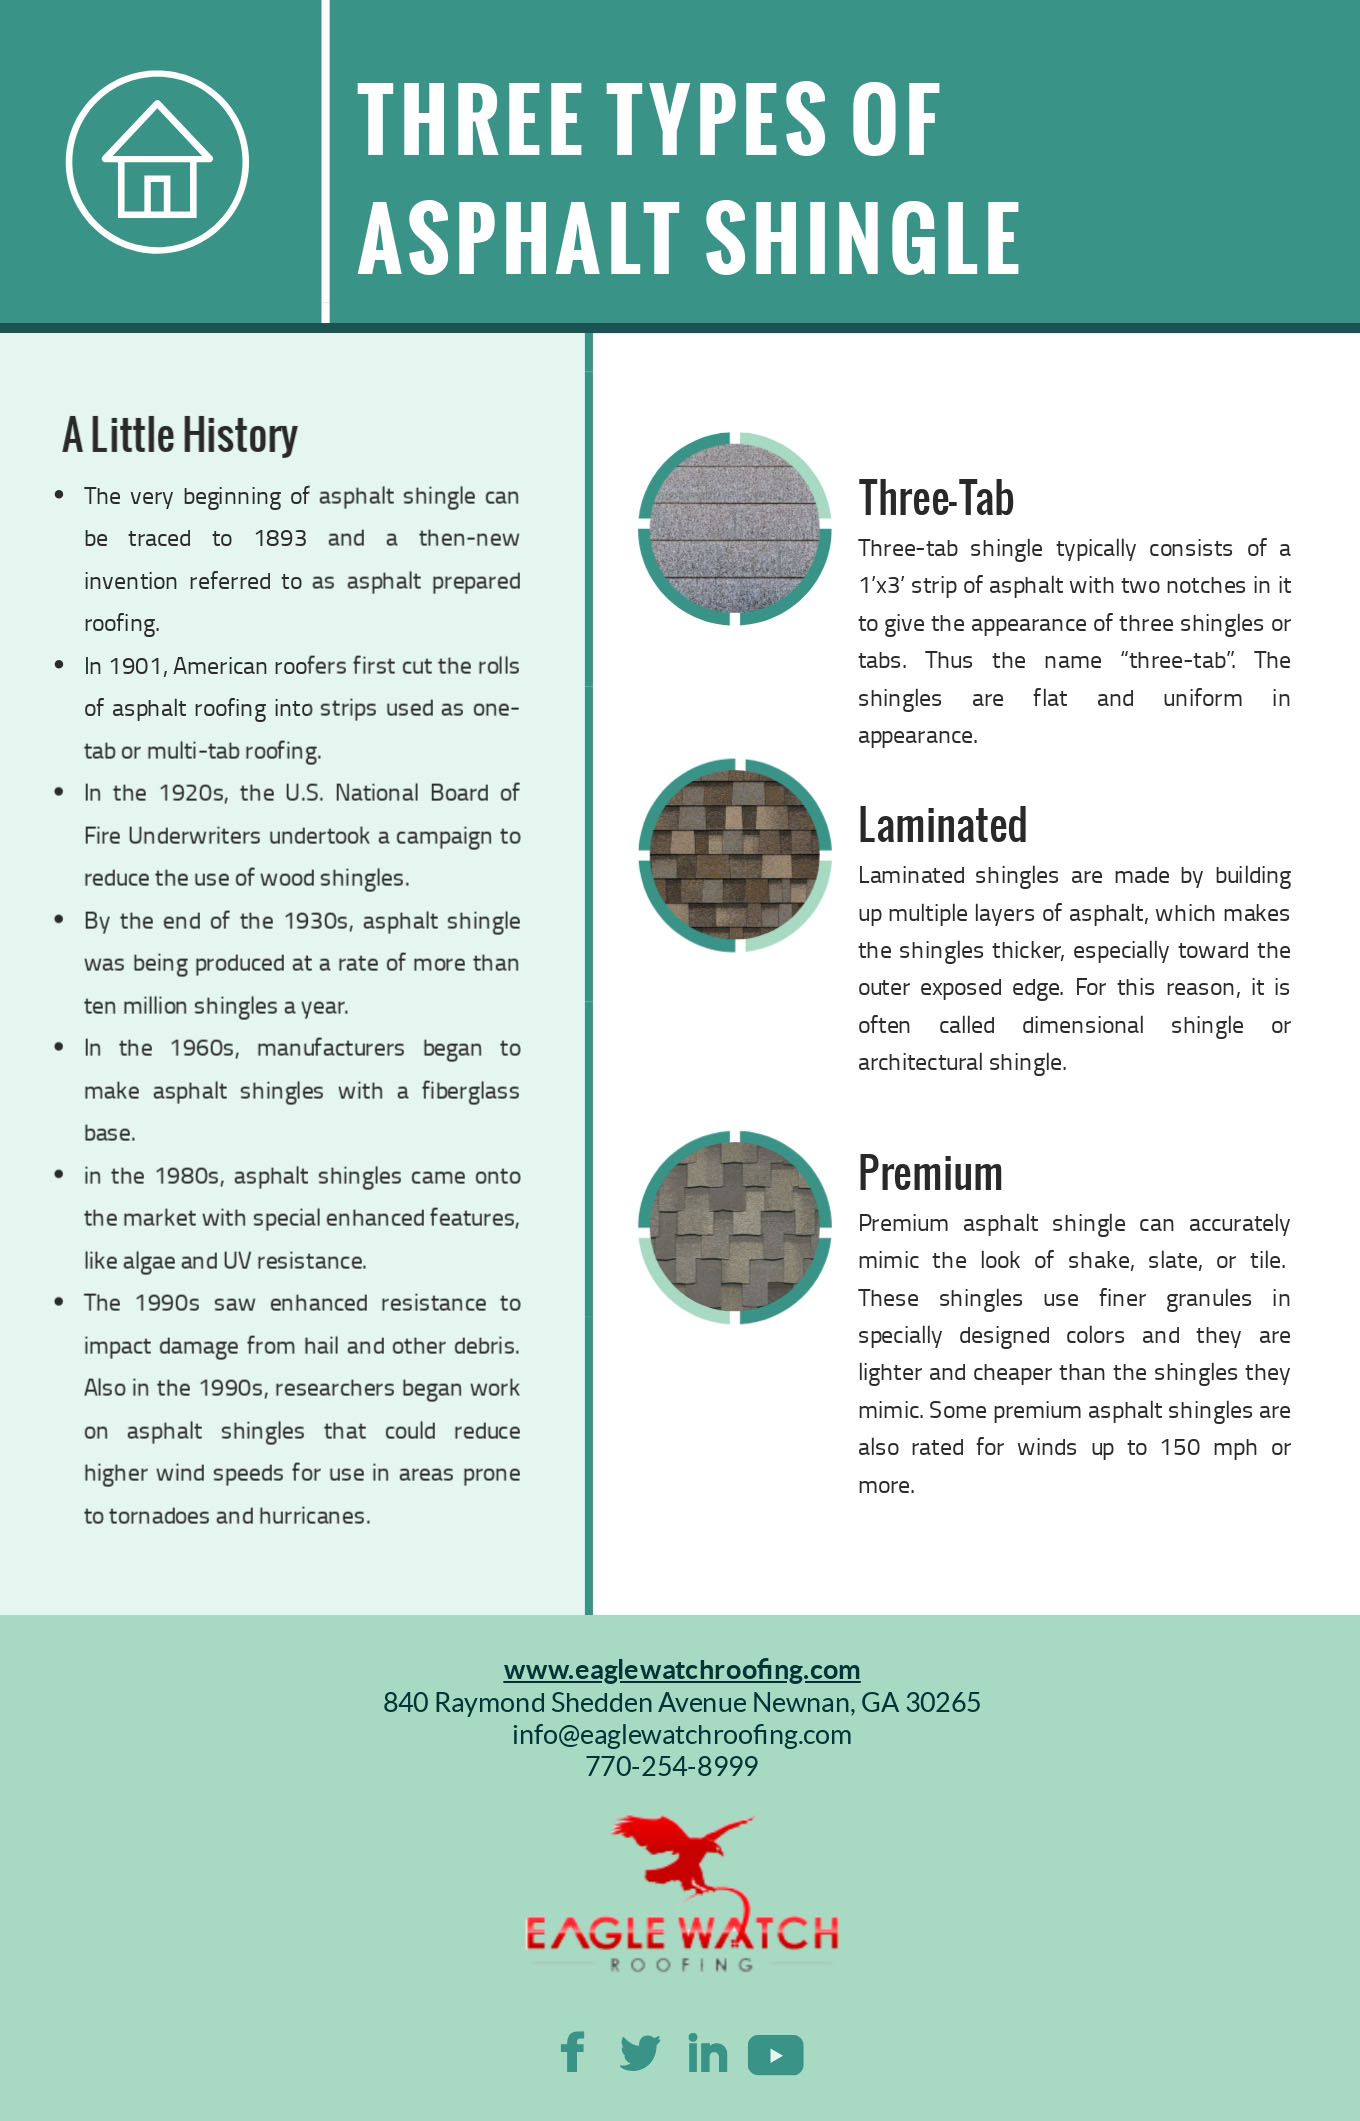 Three Types of Asphalt Shingle [infographic]